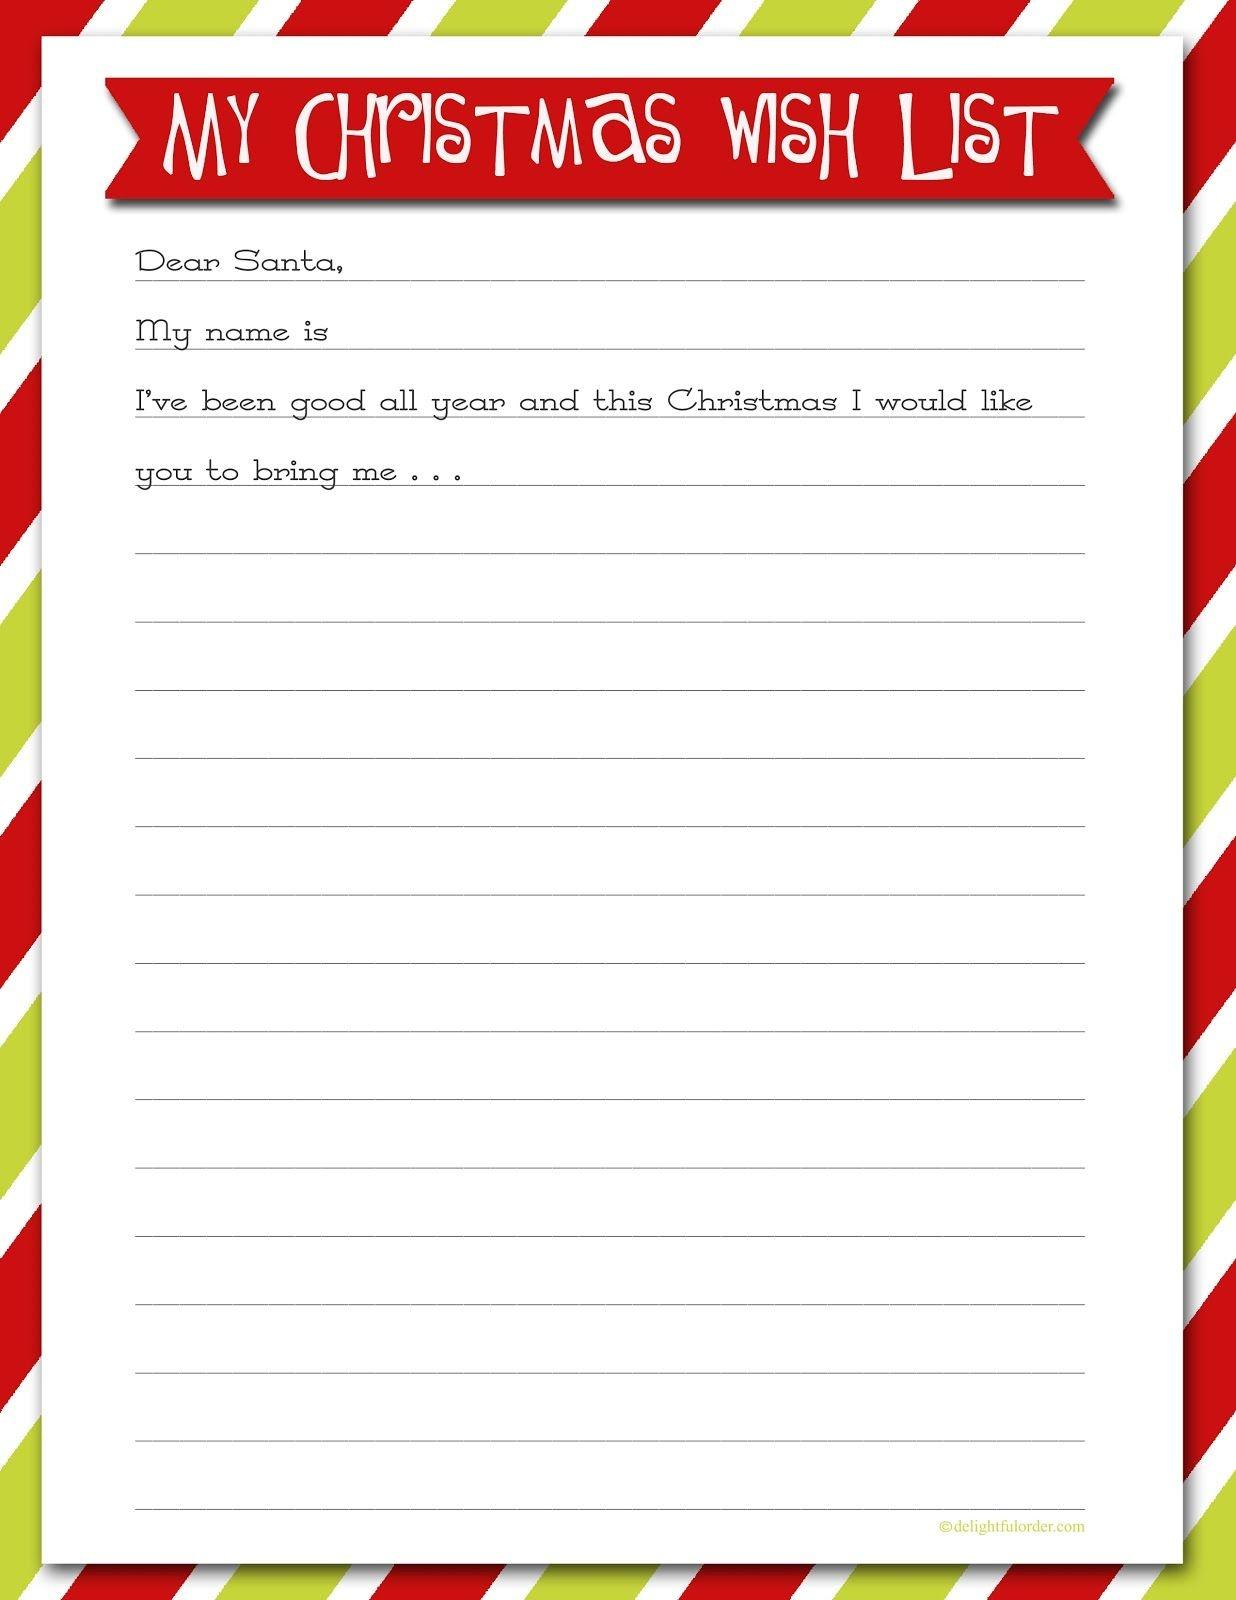 Delightful Order: Christmas Wish List - Free Printable | Delightful - Free Printable Christmas List Maker